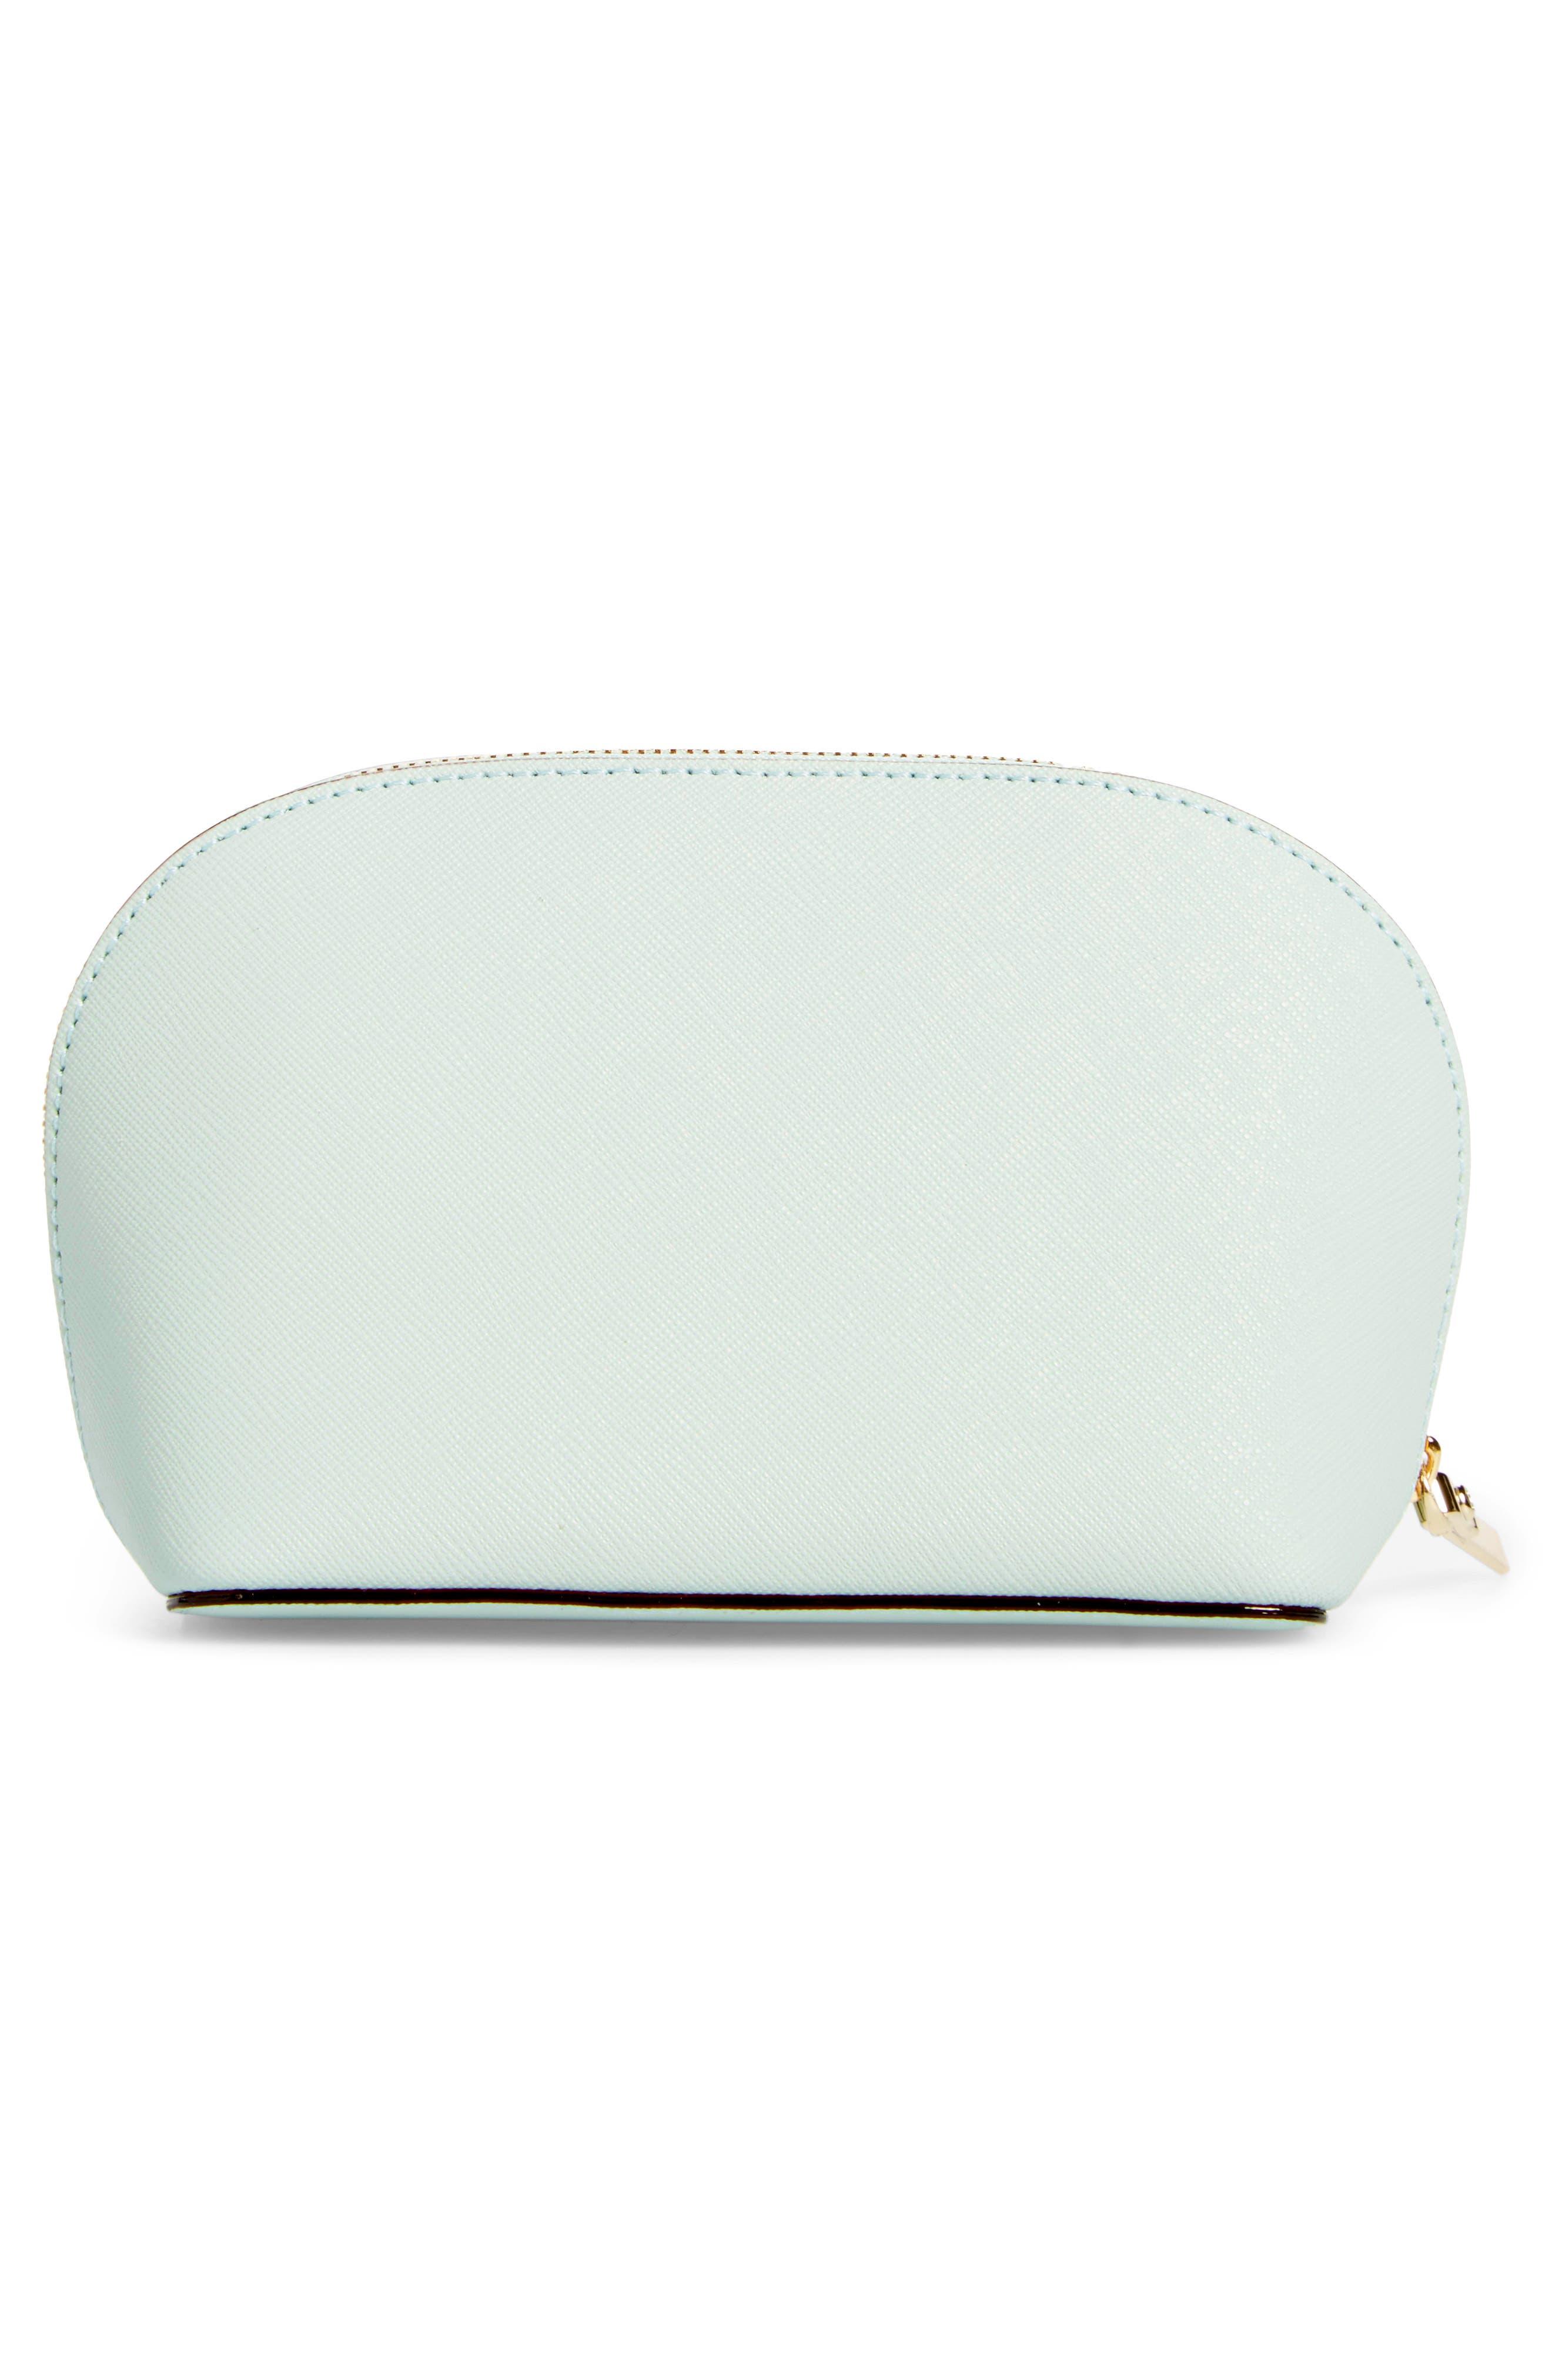 cameron street - small abalene leather cosmetics bag,                             Alternate thumbnail 2, color,                             Misty Mint